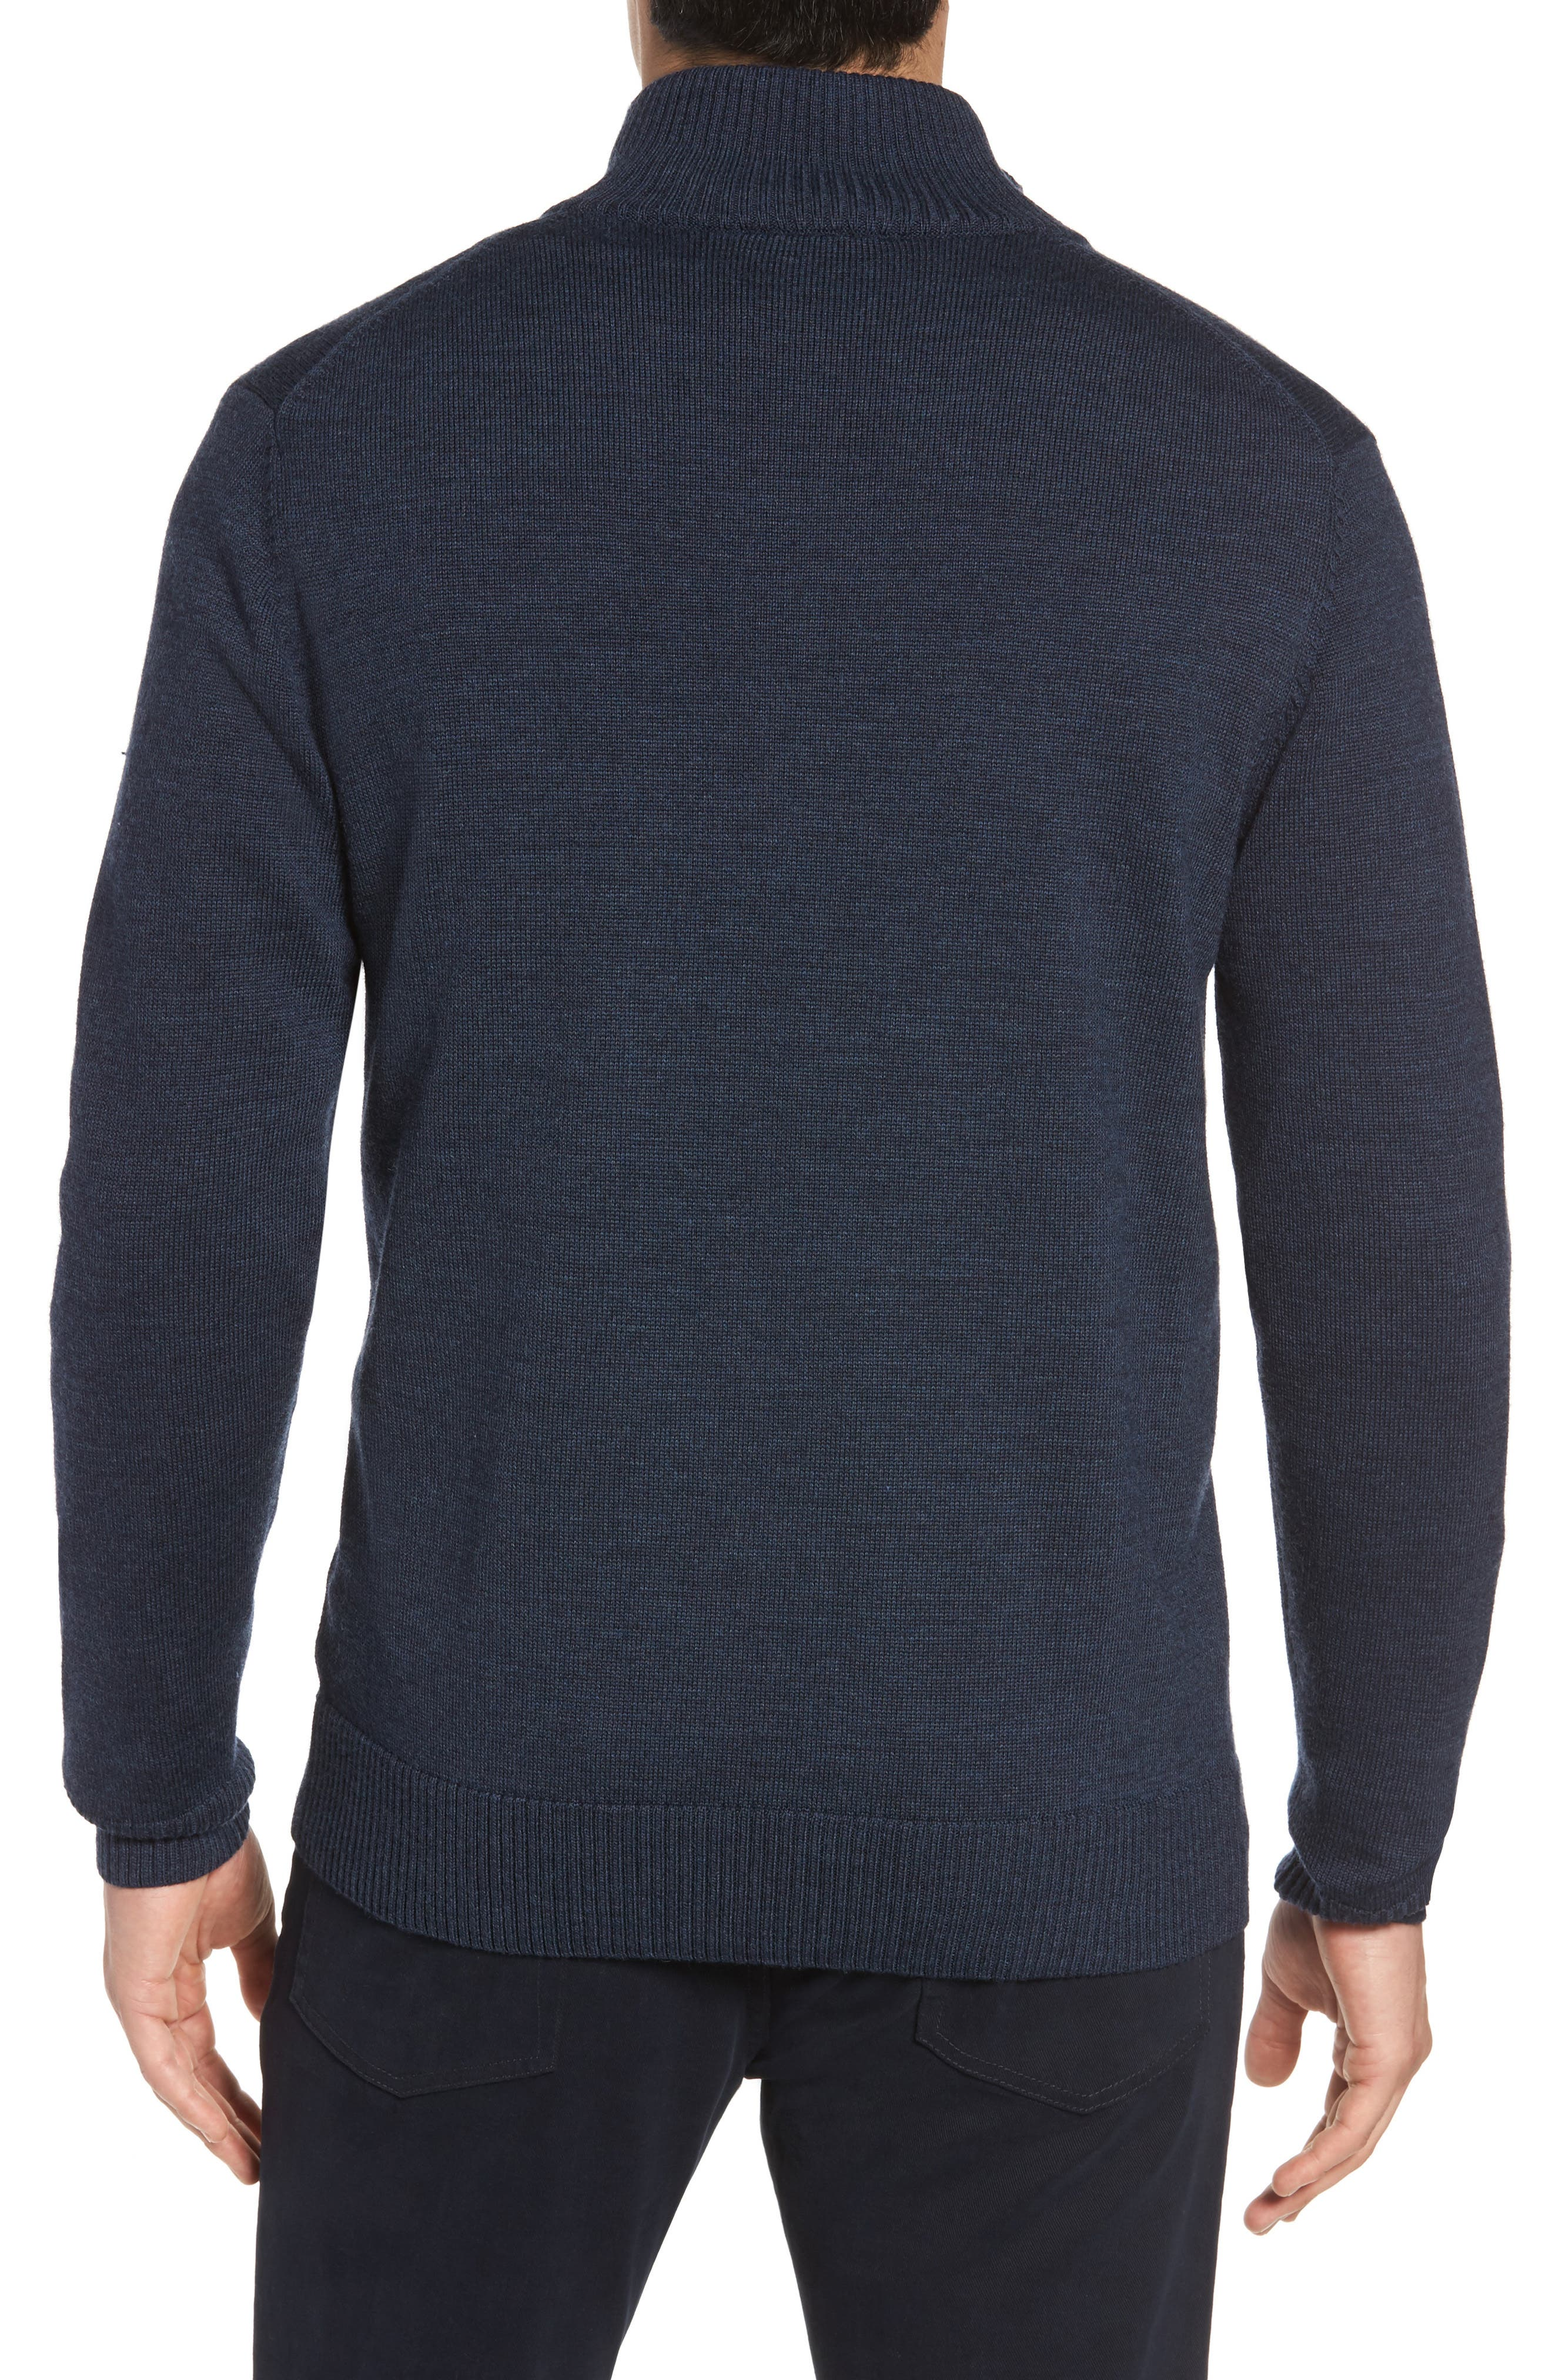 Roaring Meg Zip Wool Sweater,                             Alternate thumbnail 2, color,                             401